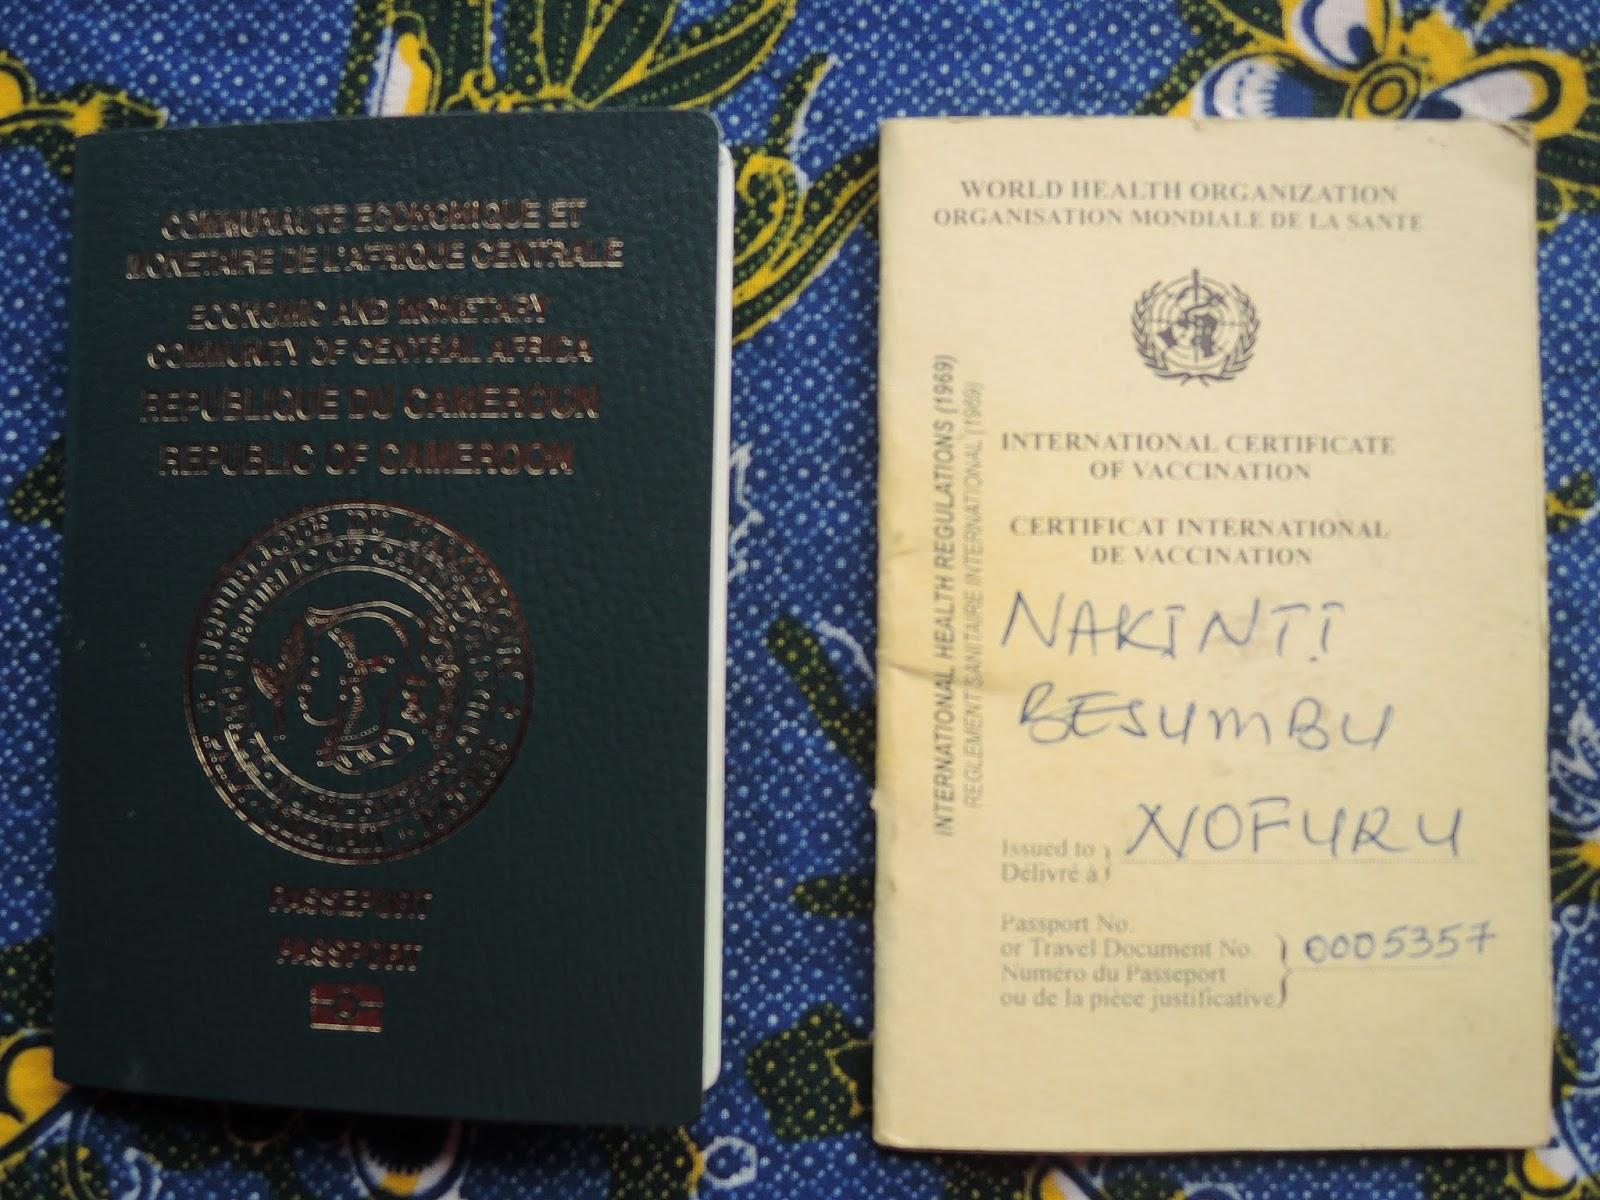 The cameroonian traveller visa on arrival policy in africa rwanda visa on arrival policy in africa rwanda a perfect example spiritdancerdesigns Choice Image